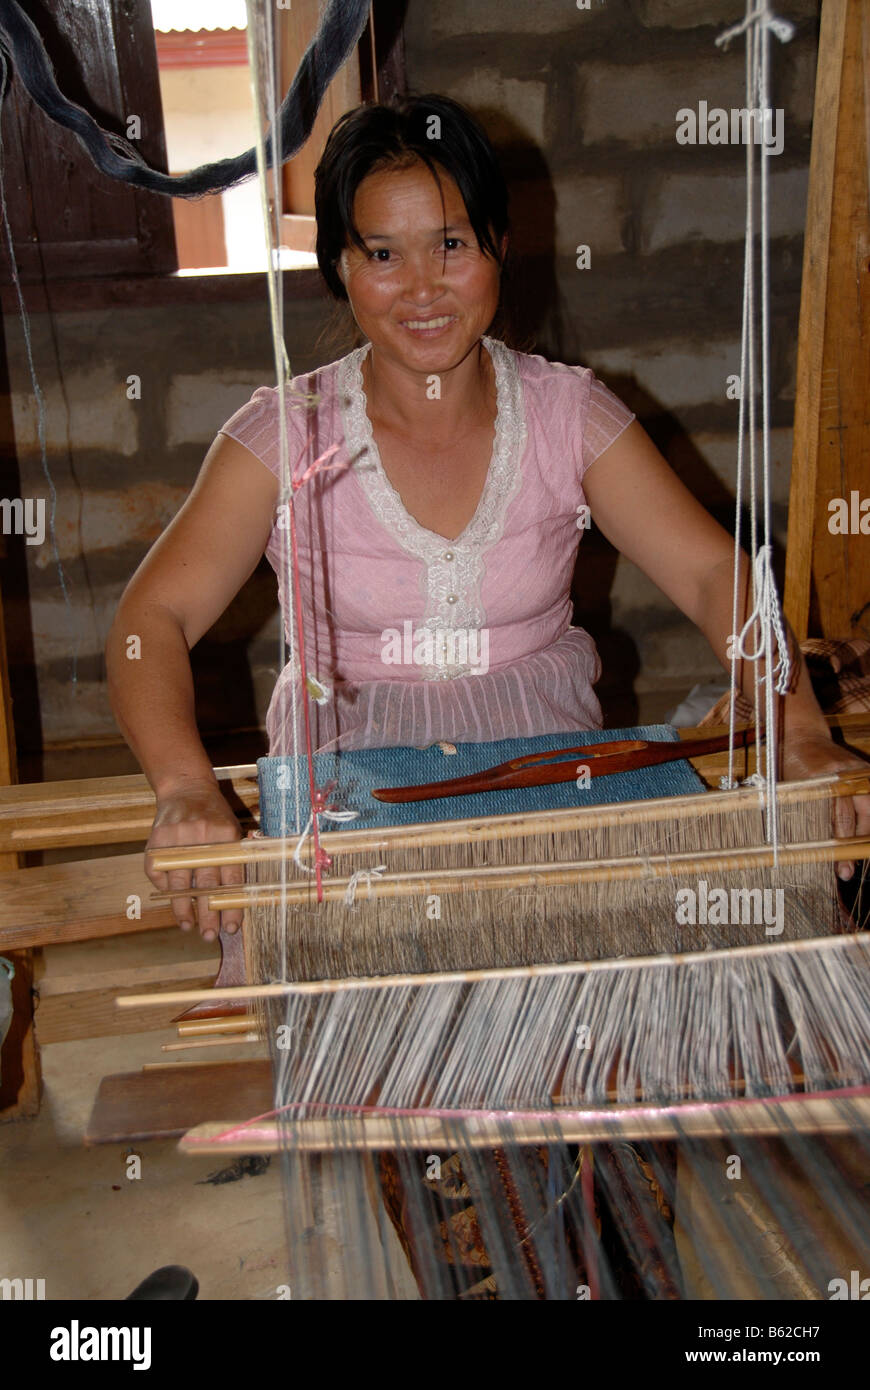 Handicraft, young woman weaving silk on a loom, Phonsavan, Xieng Khuang Province, Laos, Southeast Asia - Stock Image